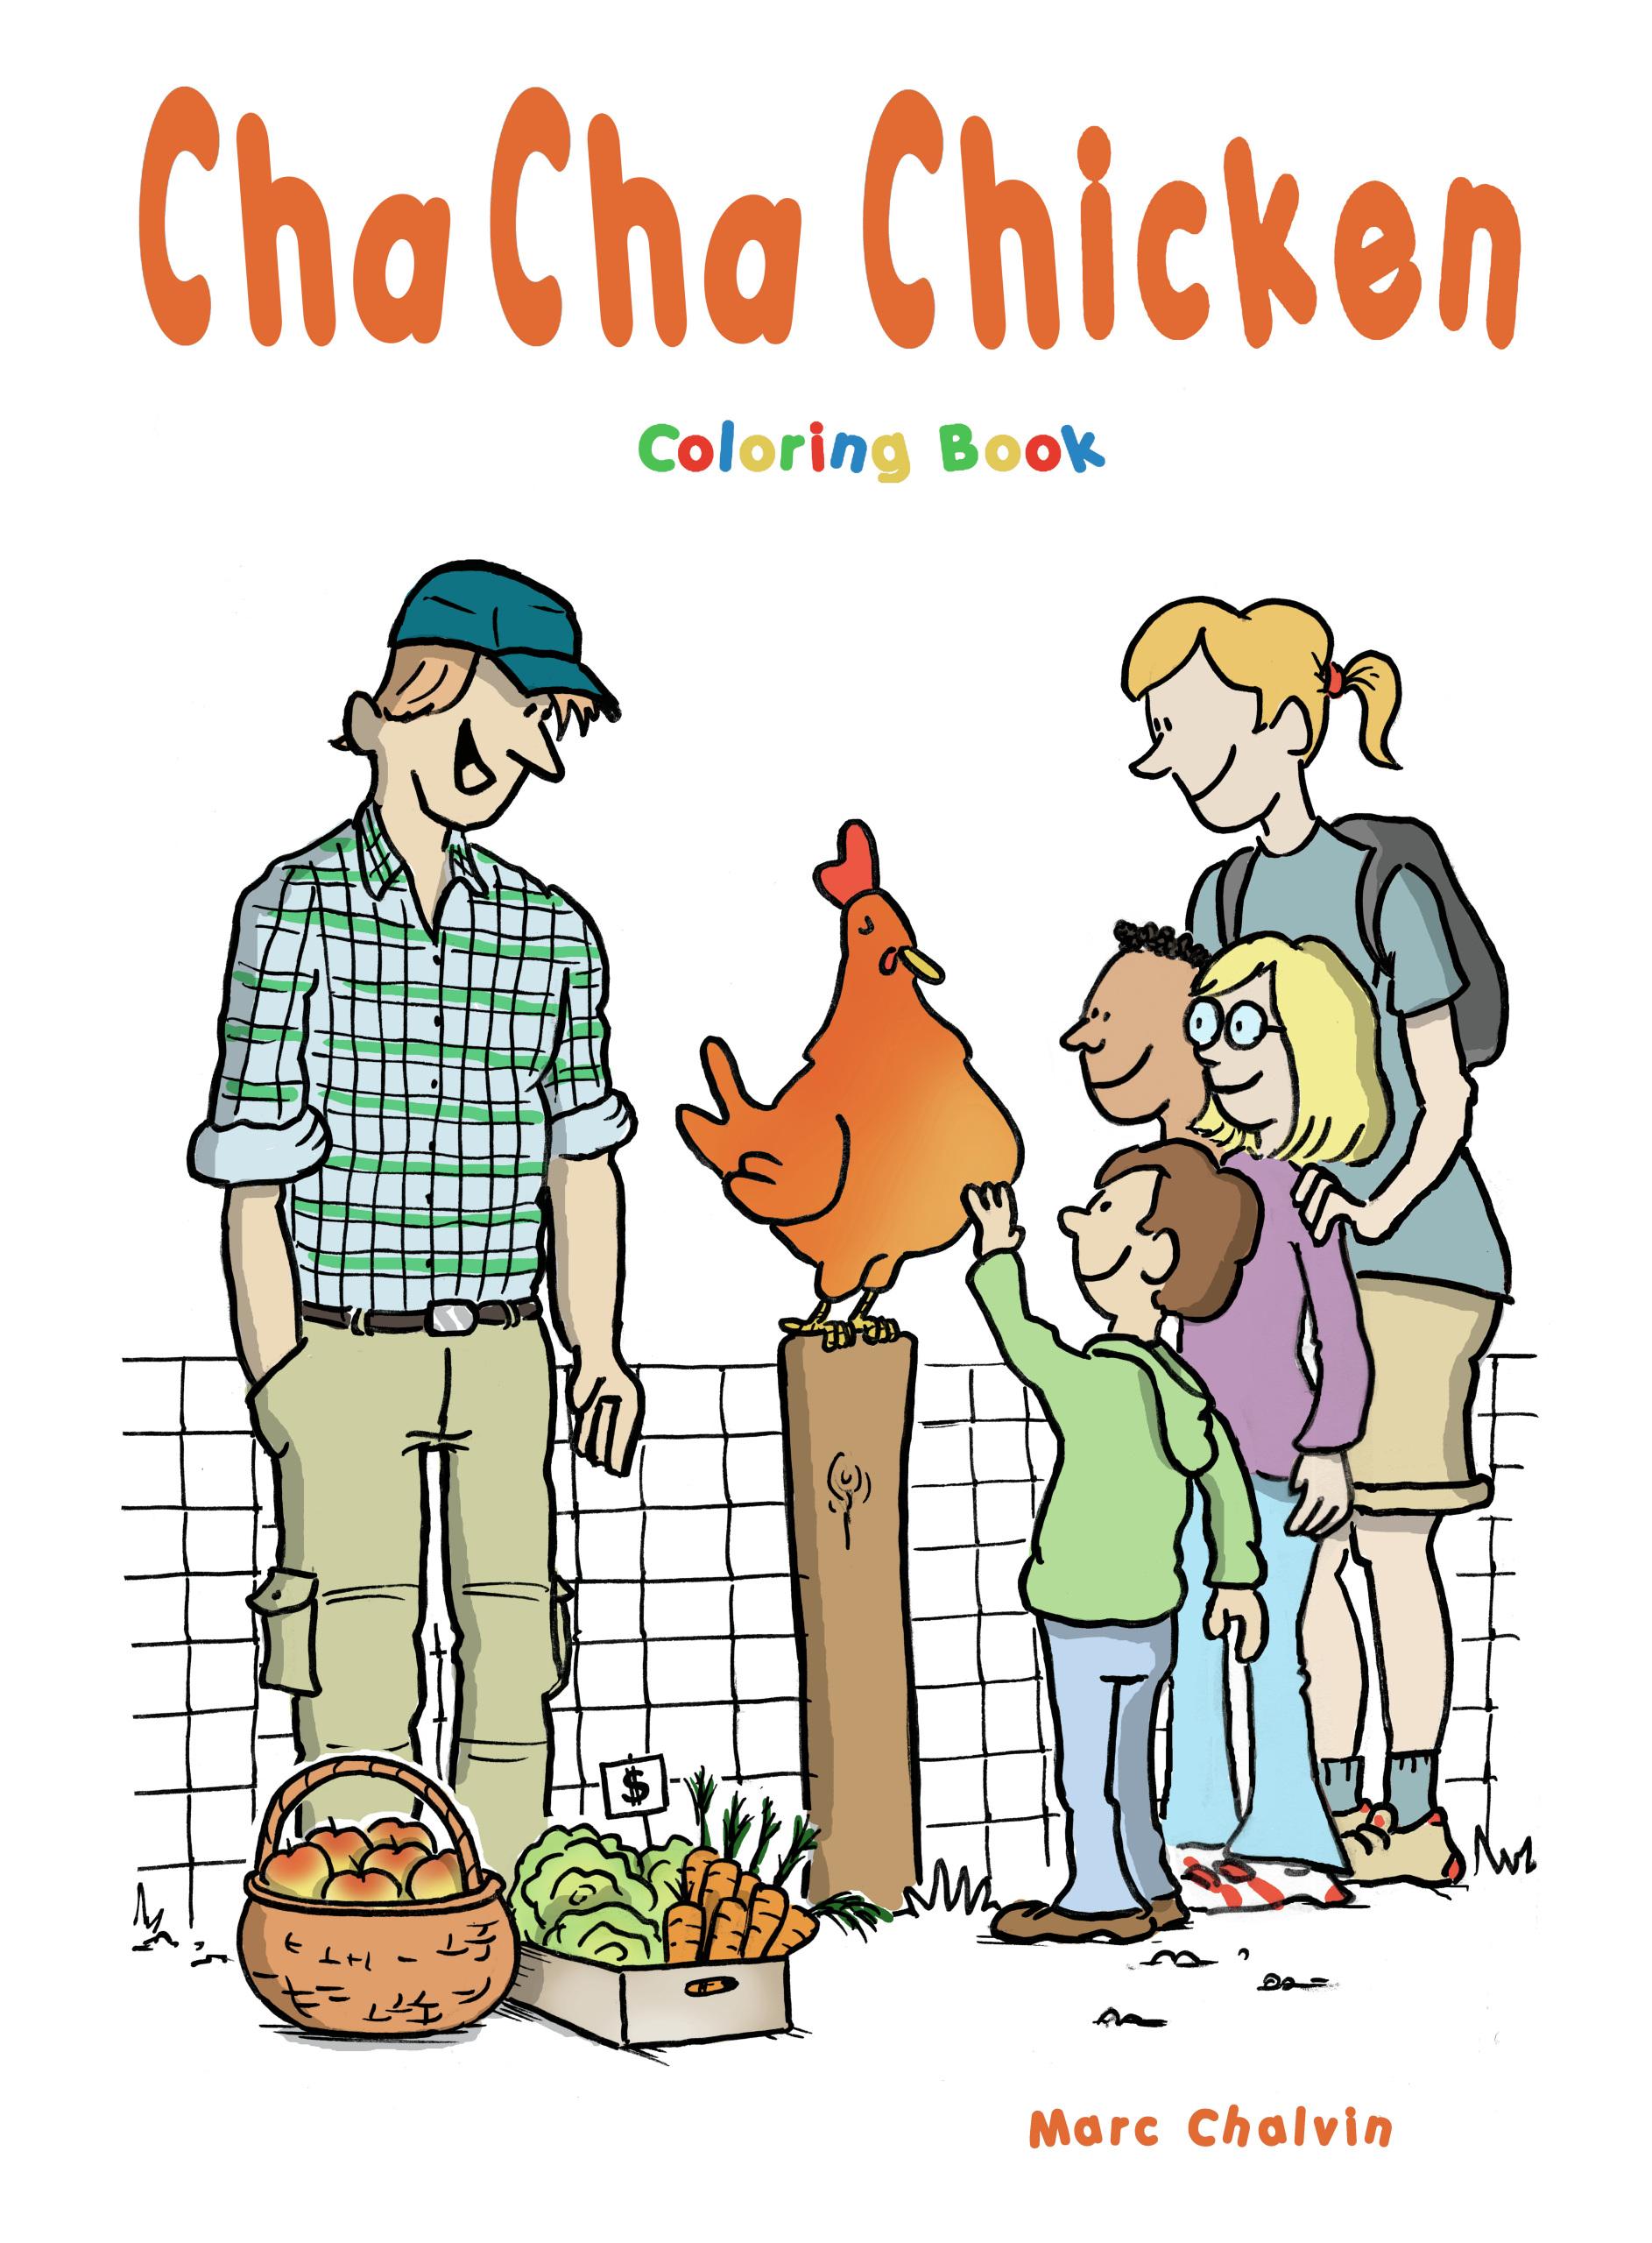 cha cha chicken coloring book